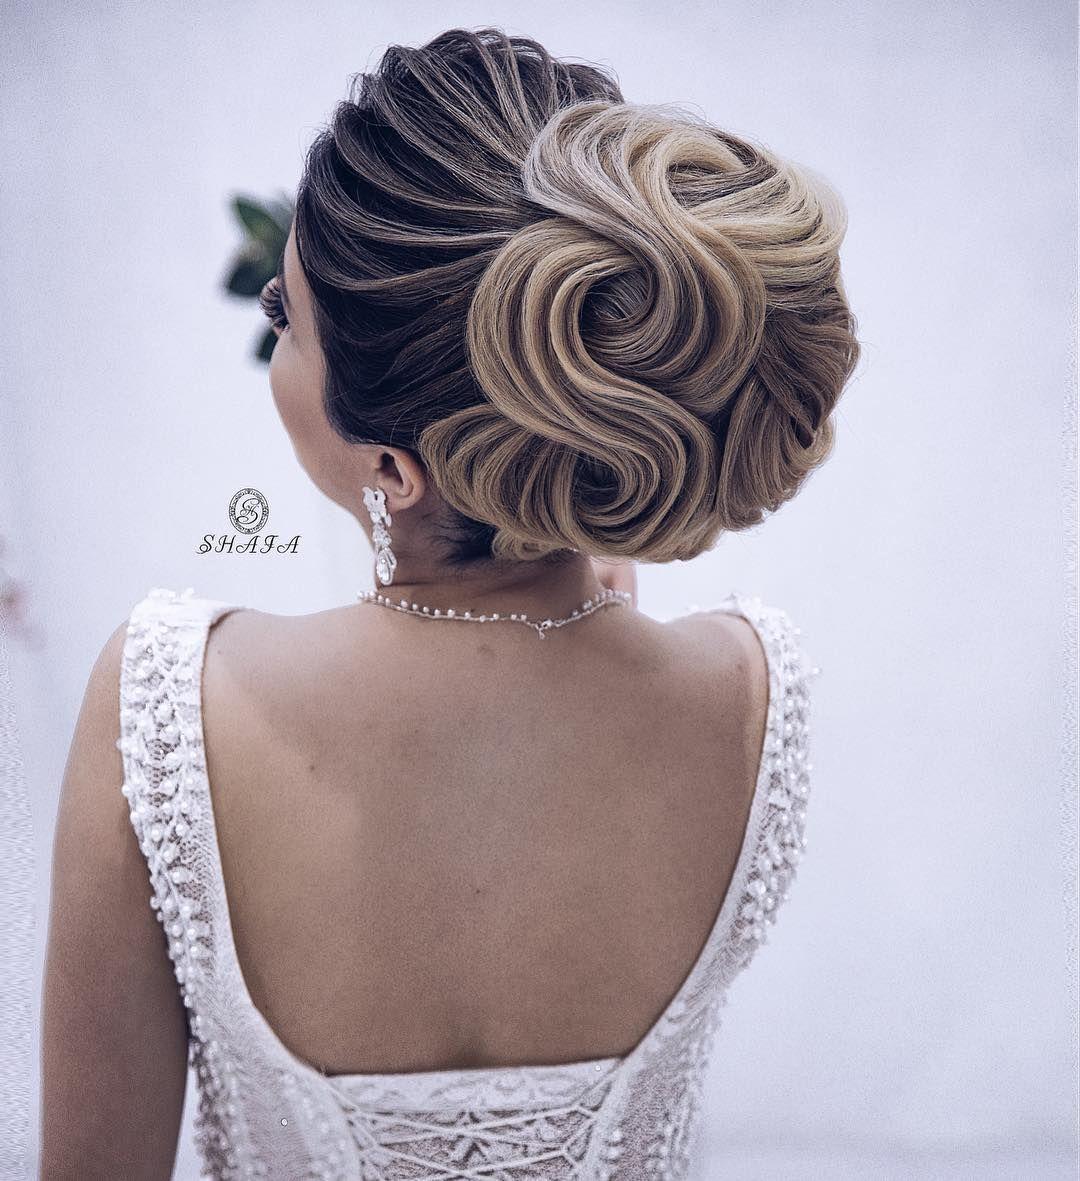 13 9b Begenme 98 Yorum Instagram 39 Da Shafaq Novruzova Shafastudio Quot Elegant Gelin Sac Duzumu Elegant Hairstyles Hair Styles Graduation Hairstyles